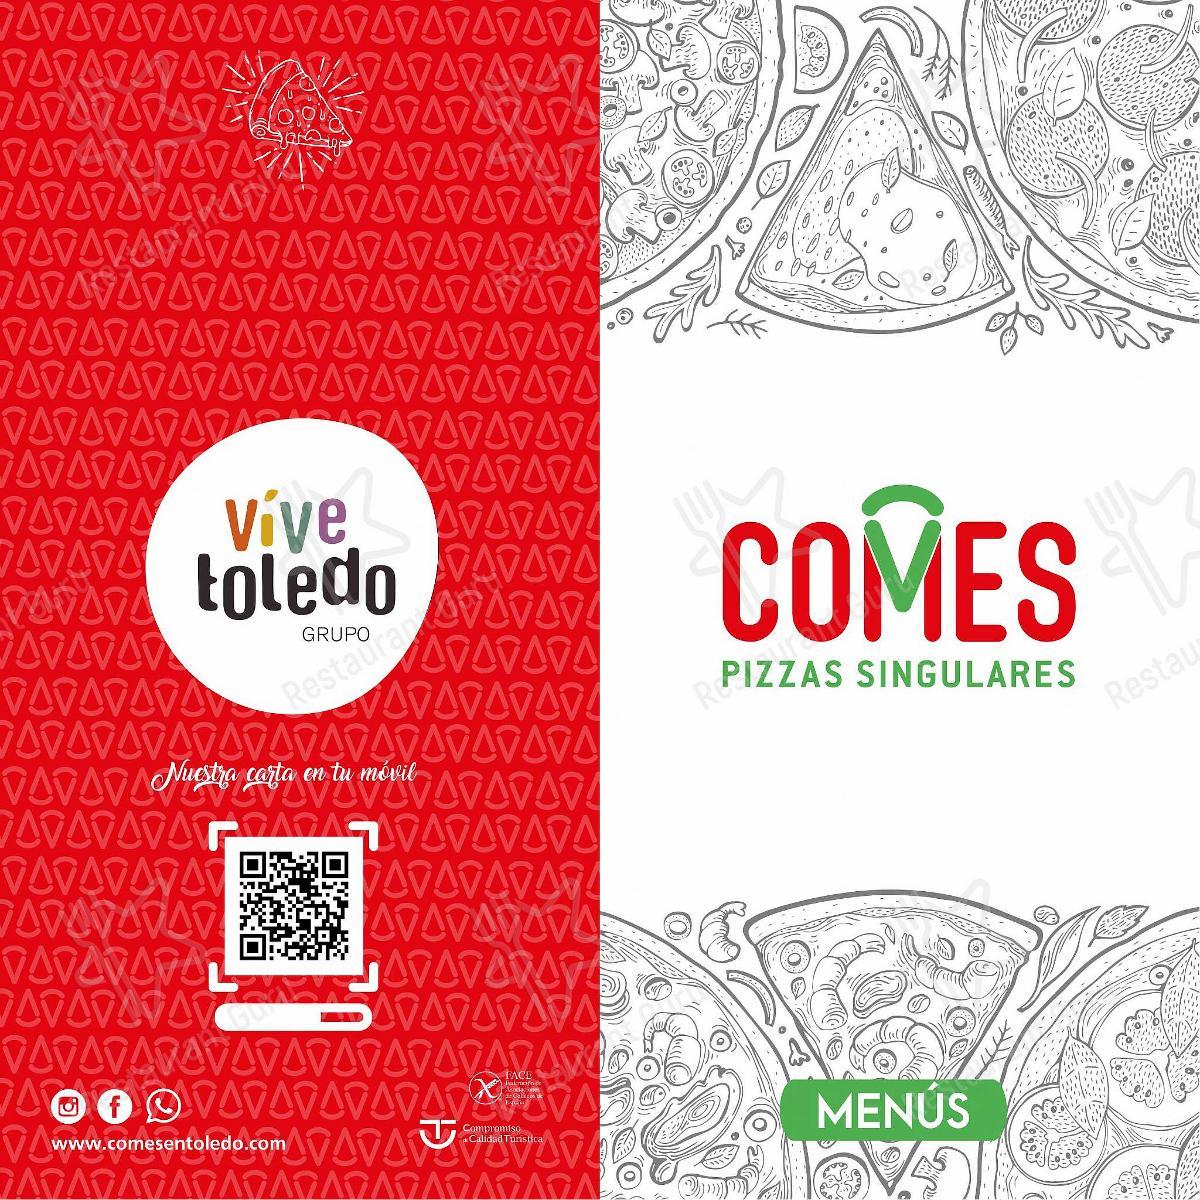 Взгляните на меню Restaurante Pizzería COMES